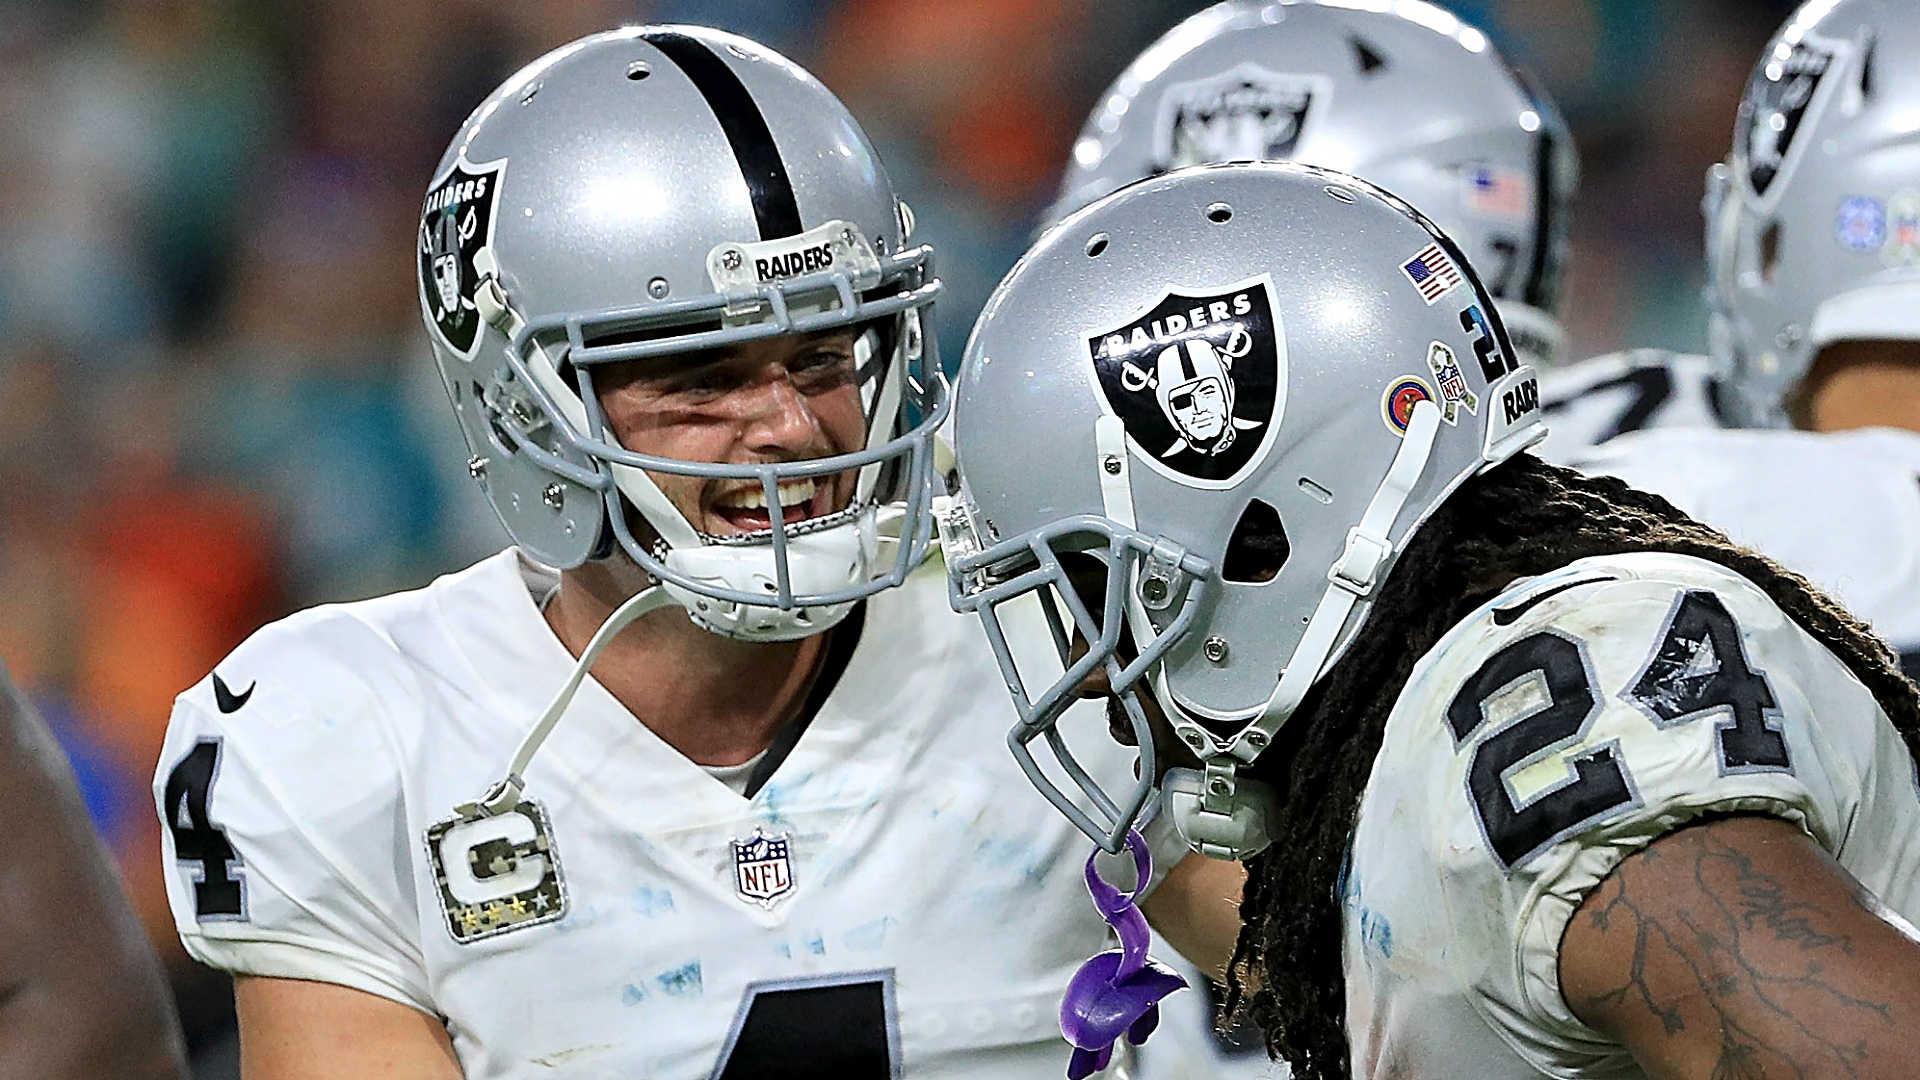 Raiders schedule 2018: Jon Gruden returns to less of a grind